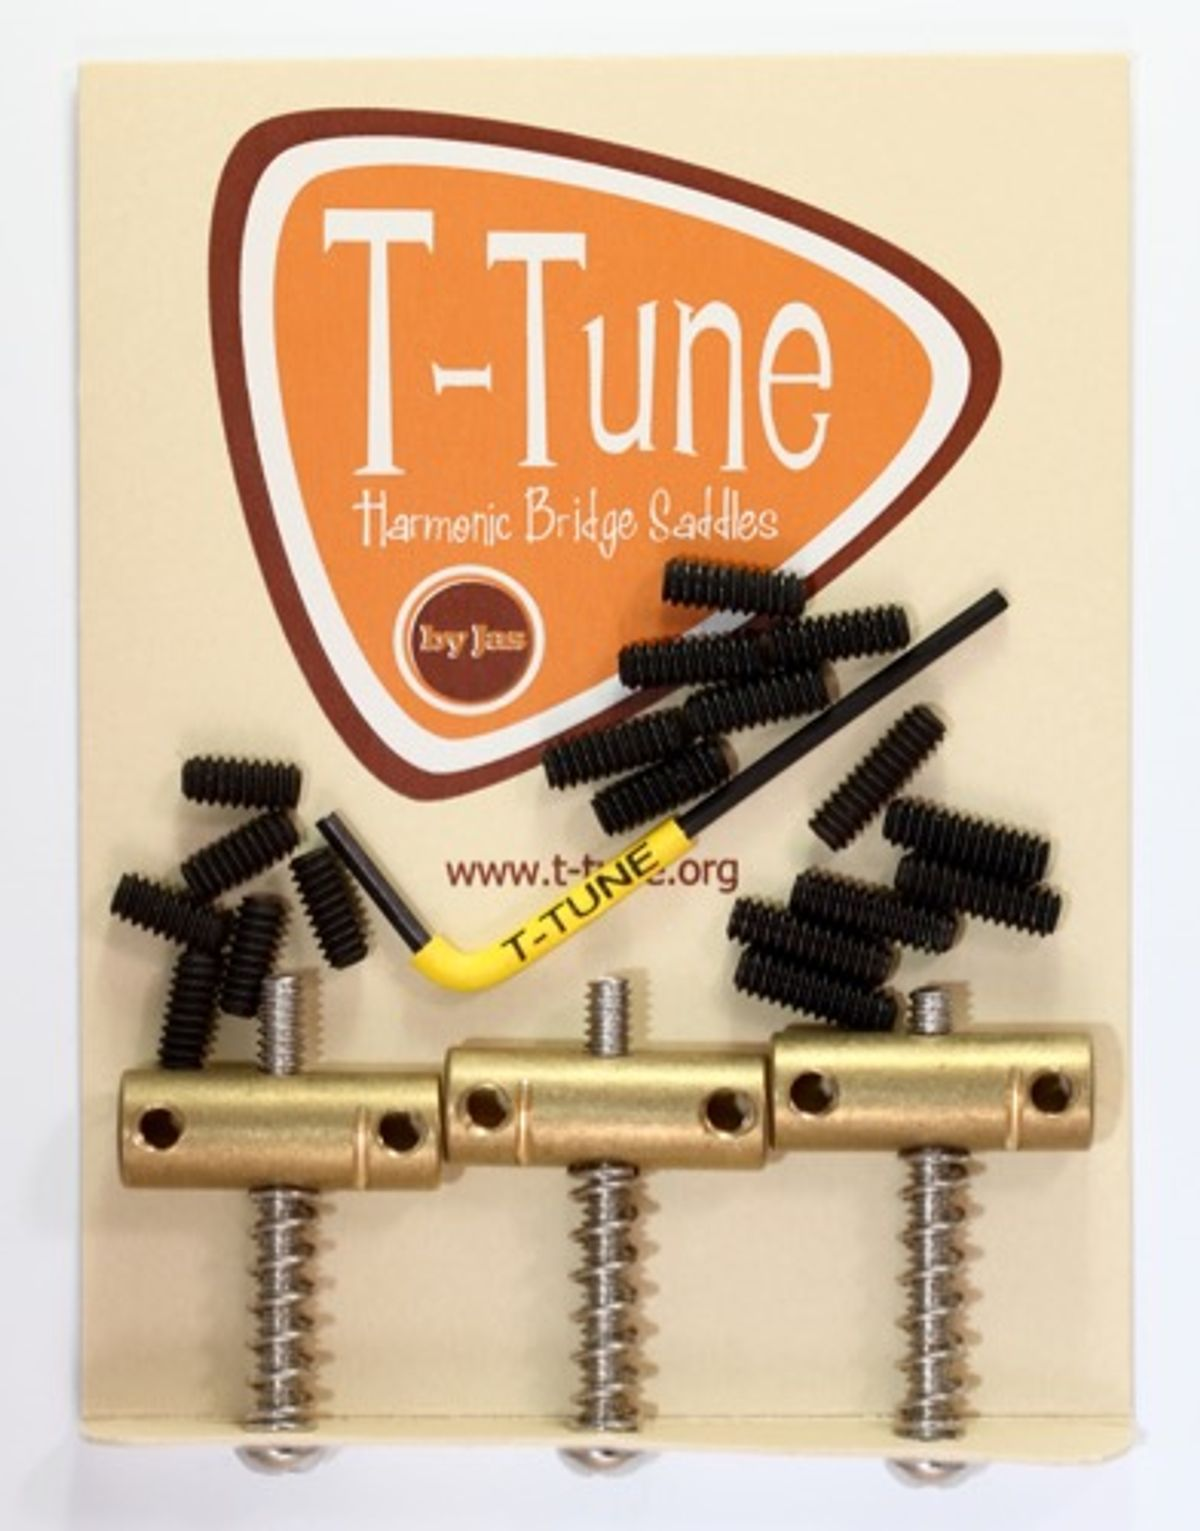 T-Tune Introduces Harmonic Bridge Saddles